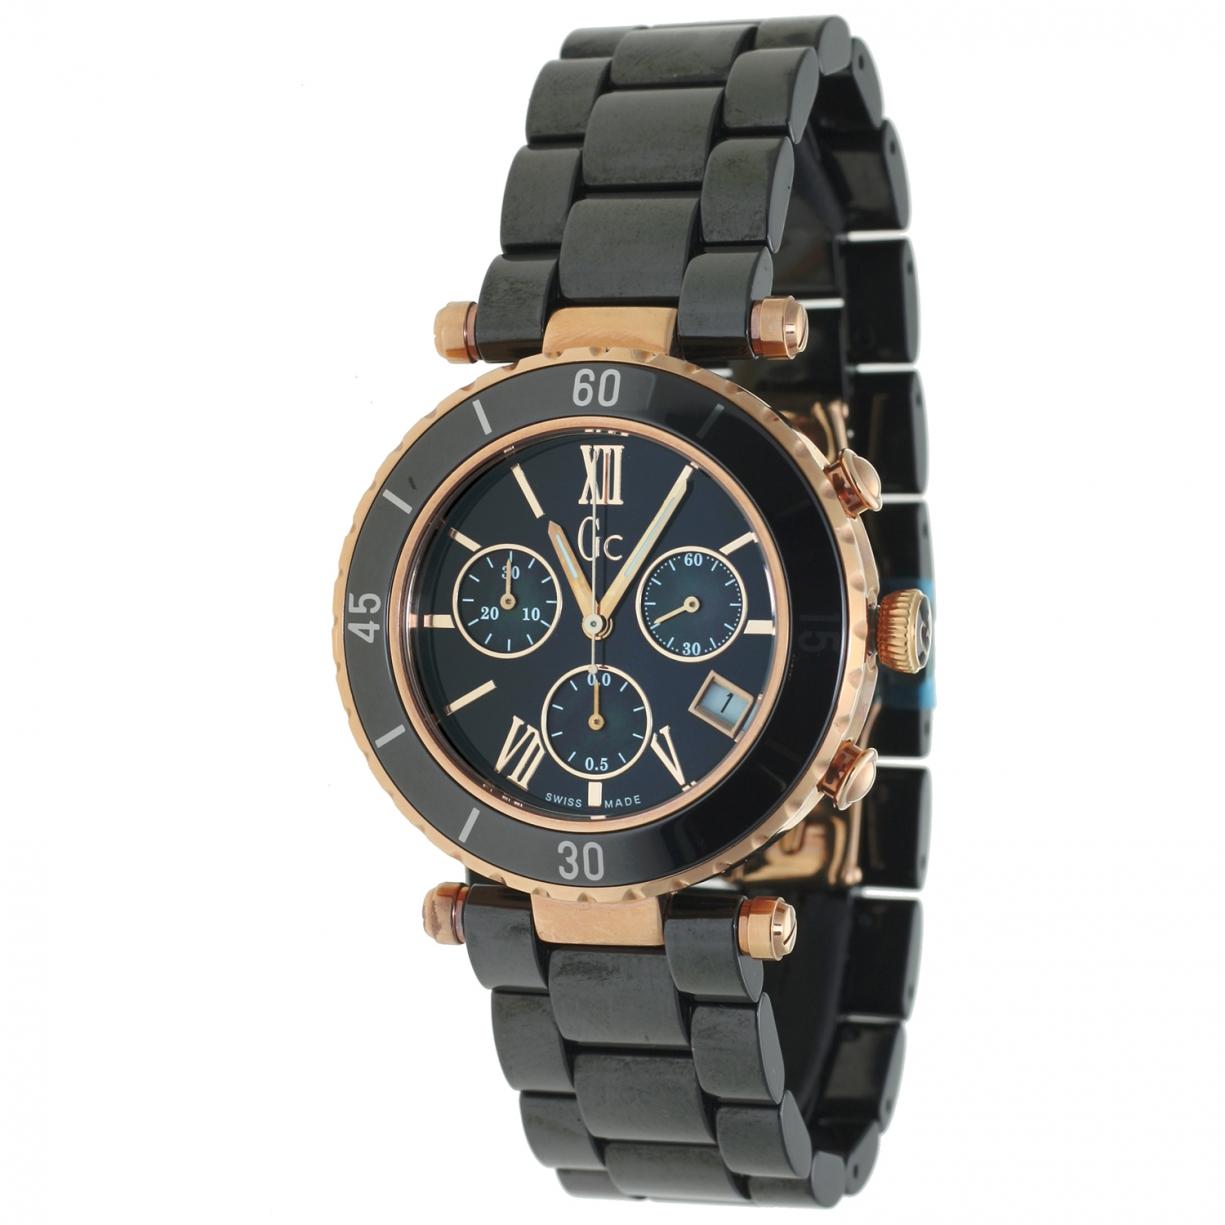 c42080e4b7cf Reloj De Pulsera Guess Analogico Para Mujer. Modelo 147504m2s